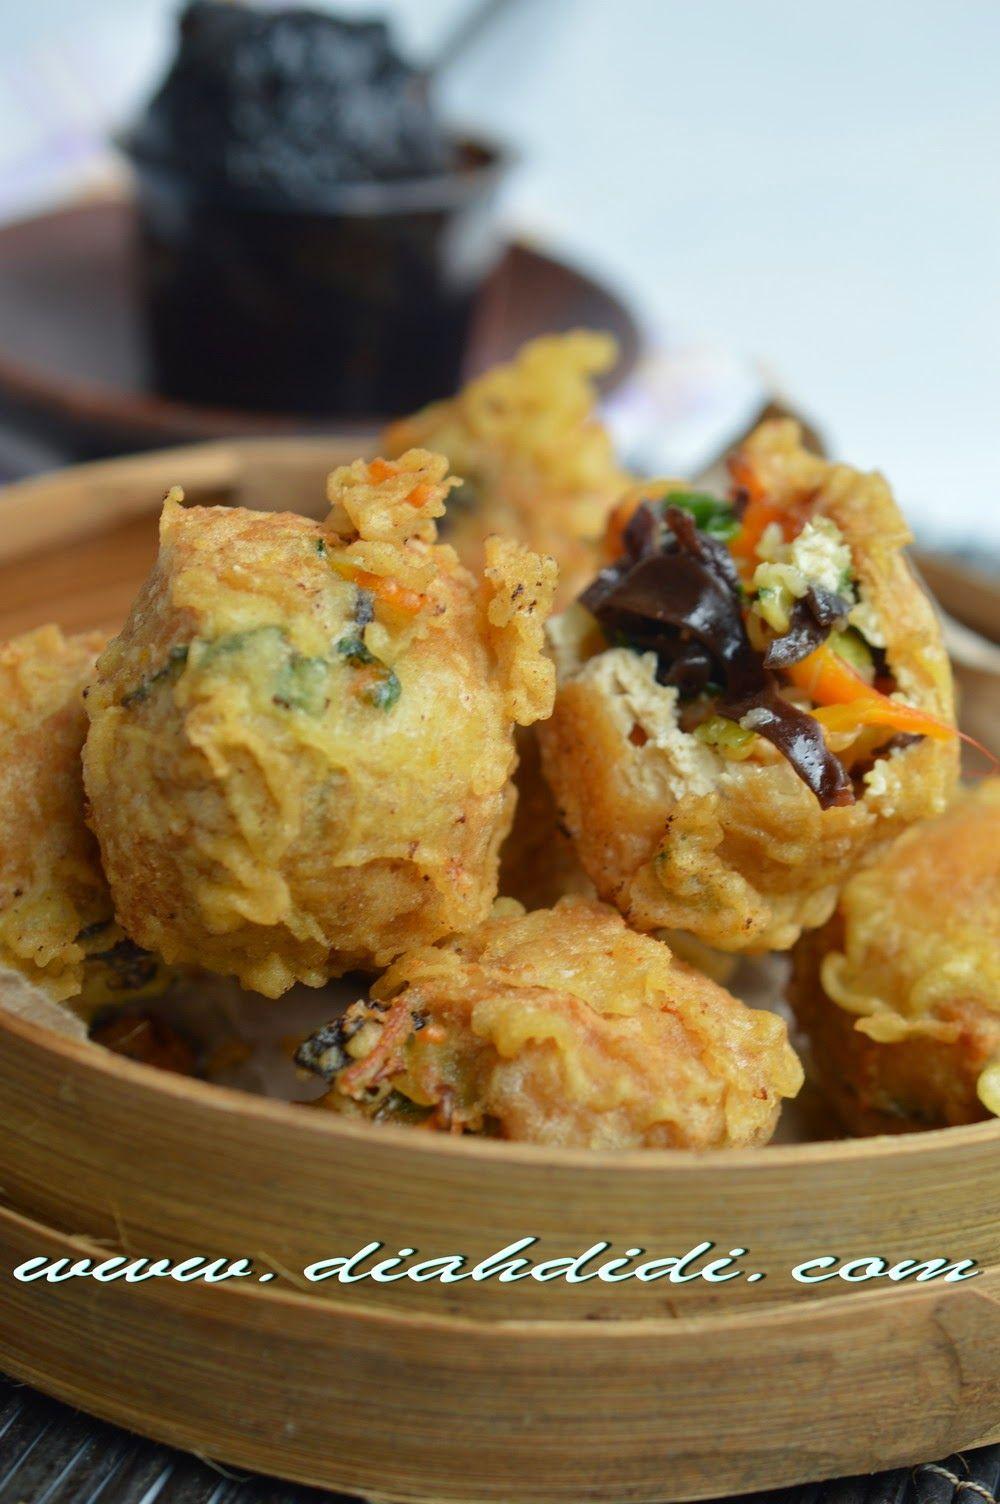 Gambar Tahu Mercon : gambar, mercon, Didi's, Kitchen:, Mercon..Pedasss, Resep, Tahu,, Masakan,, Makanan